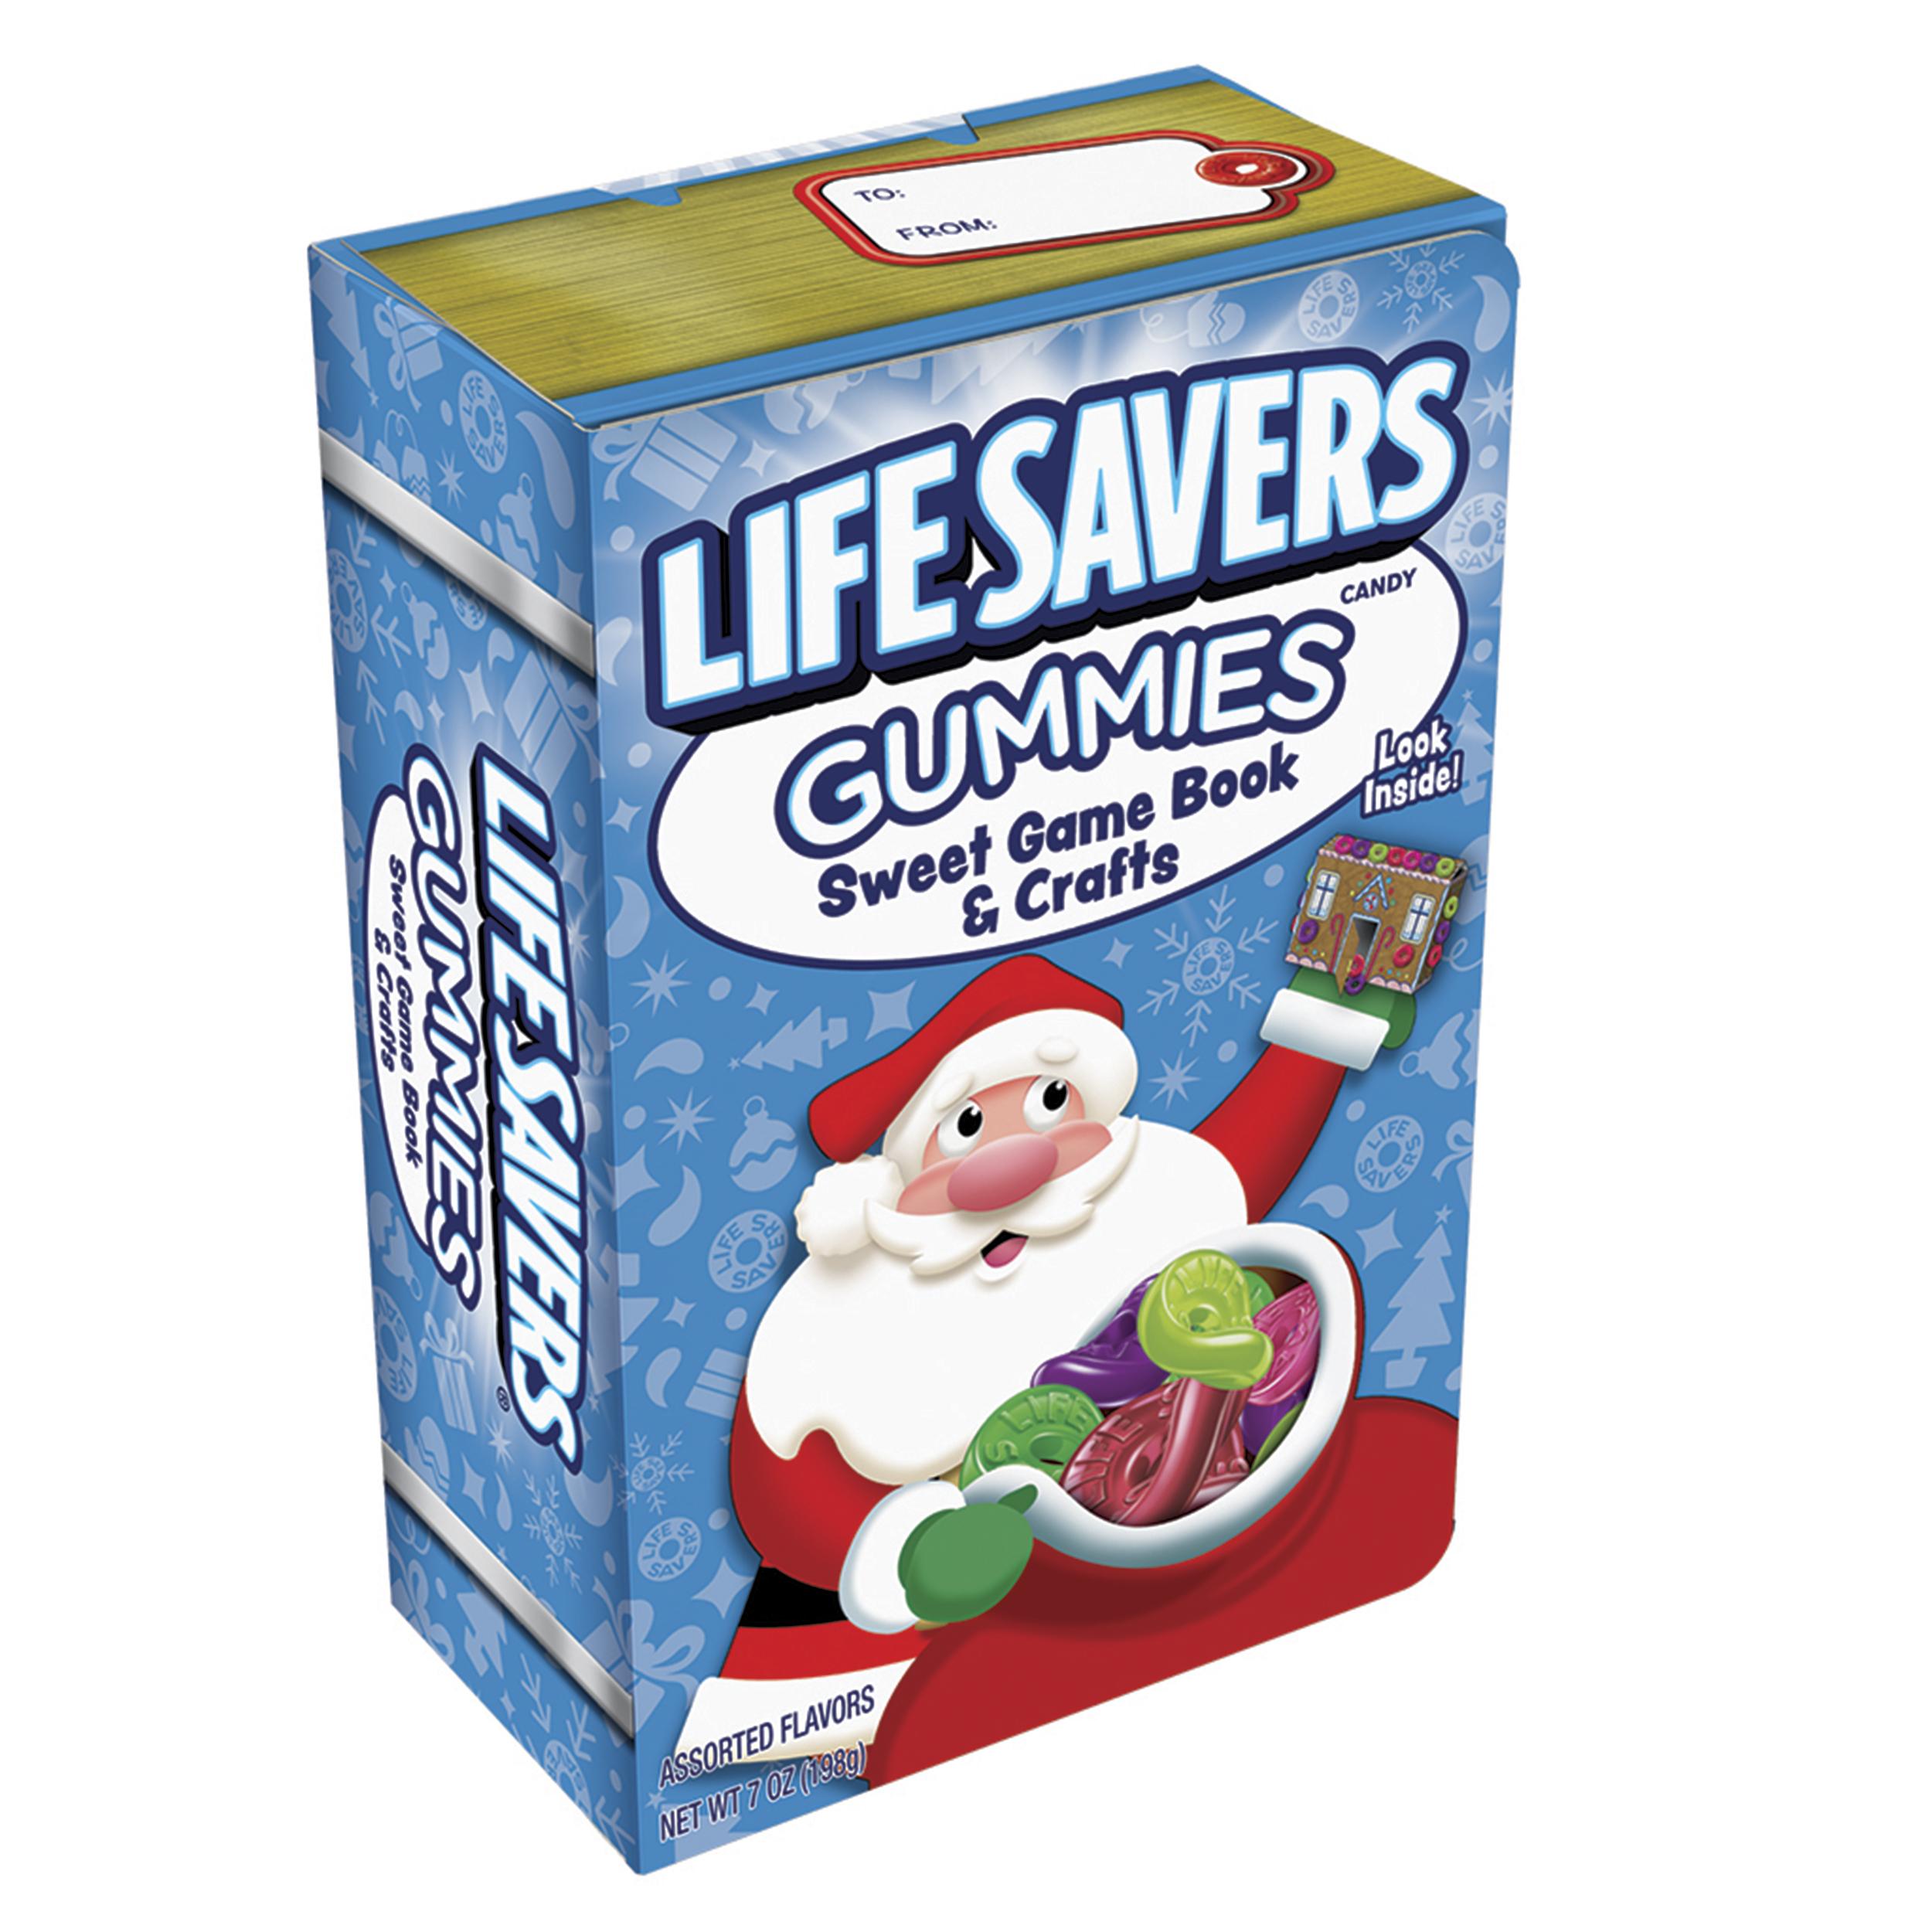 Life Savers, Gummies Sweet Game Holiday Book & Crafts, 7 Oz, 6 Ct